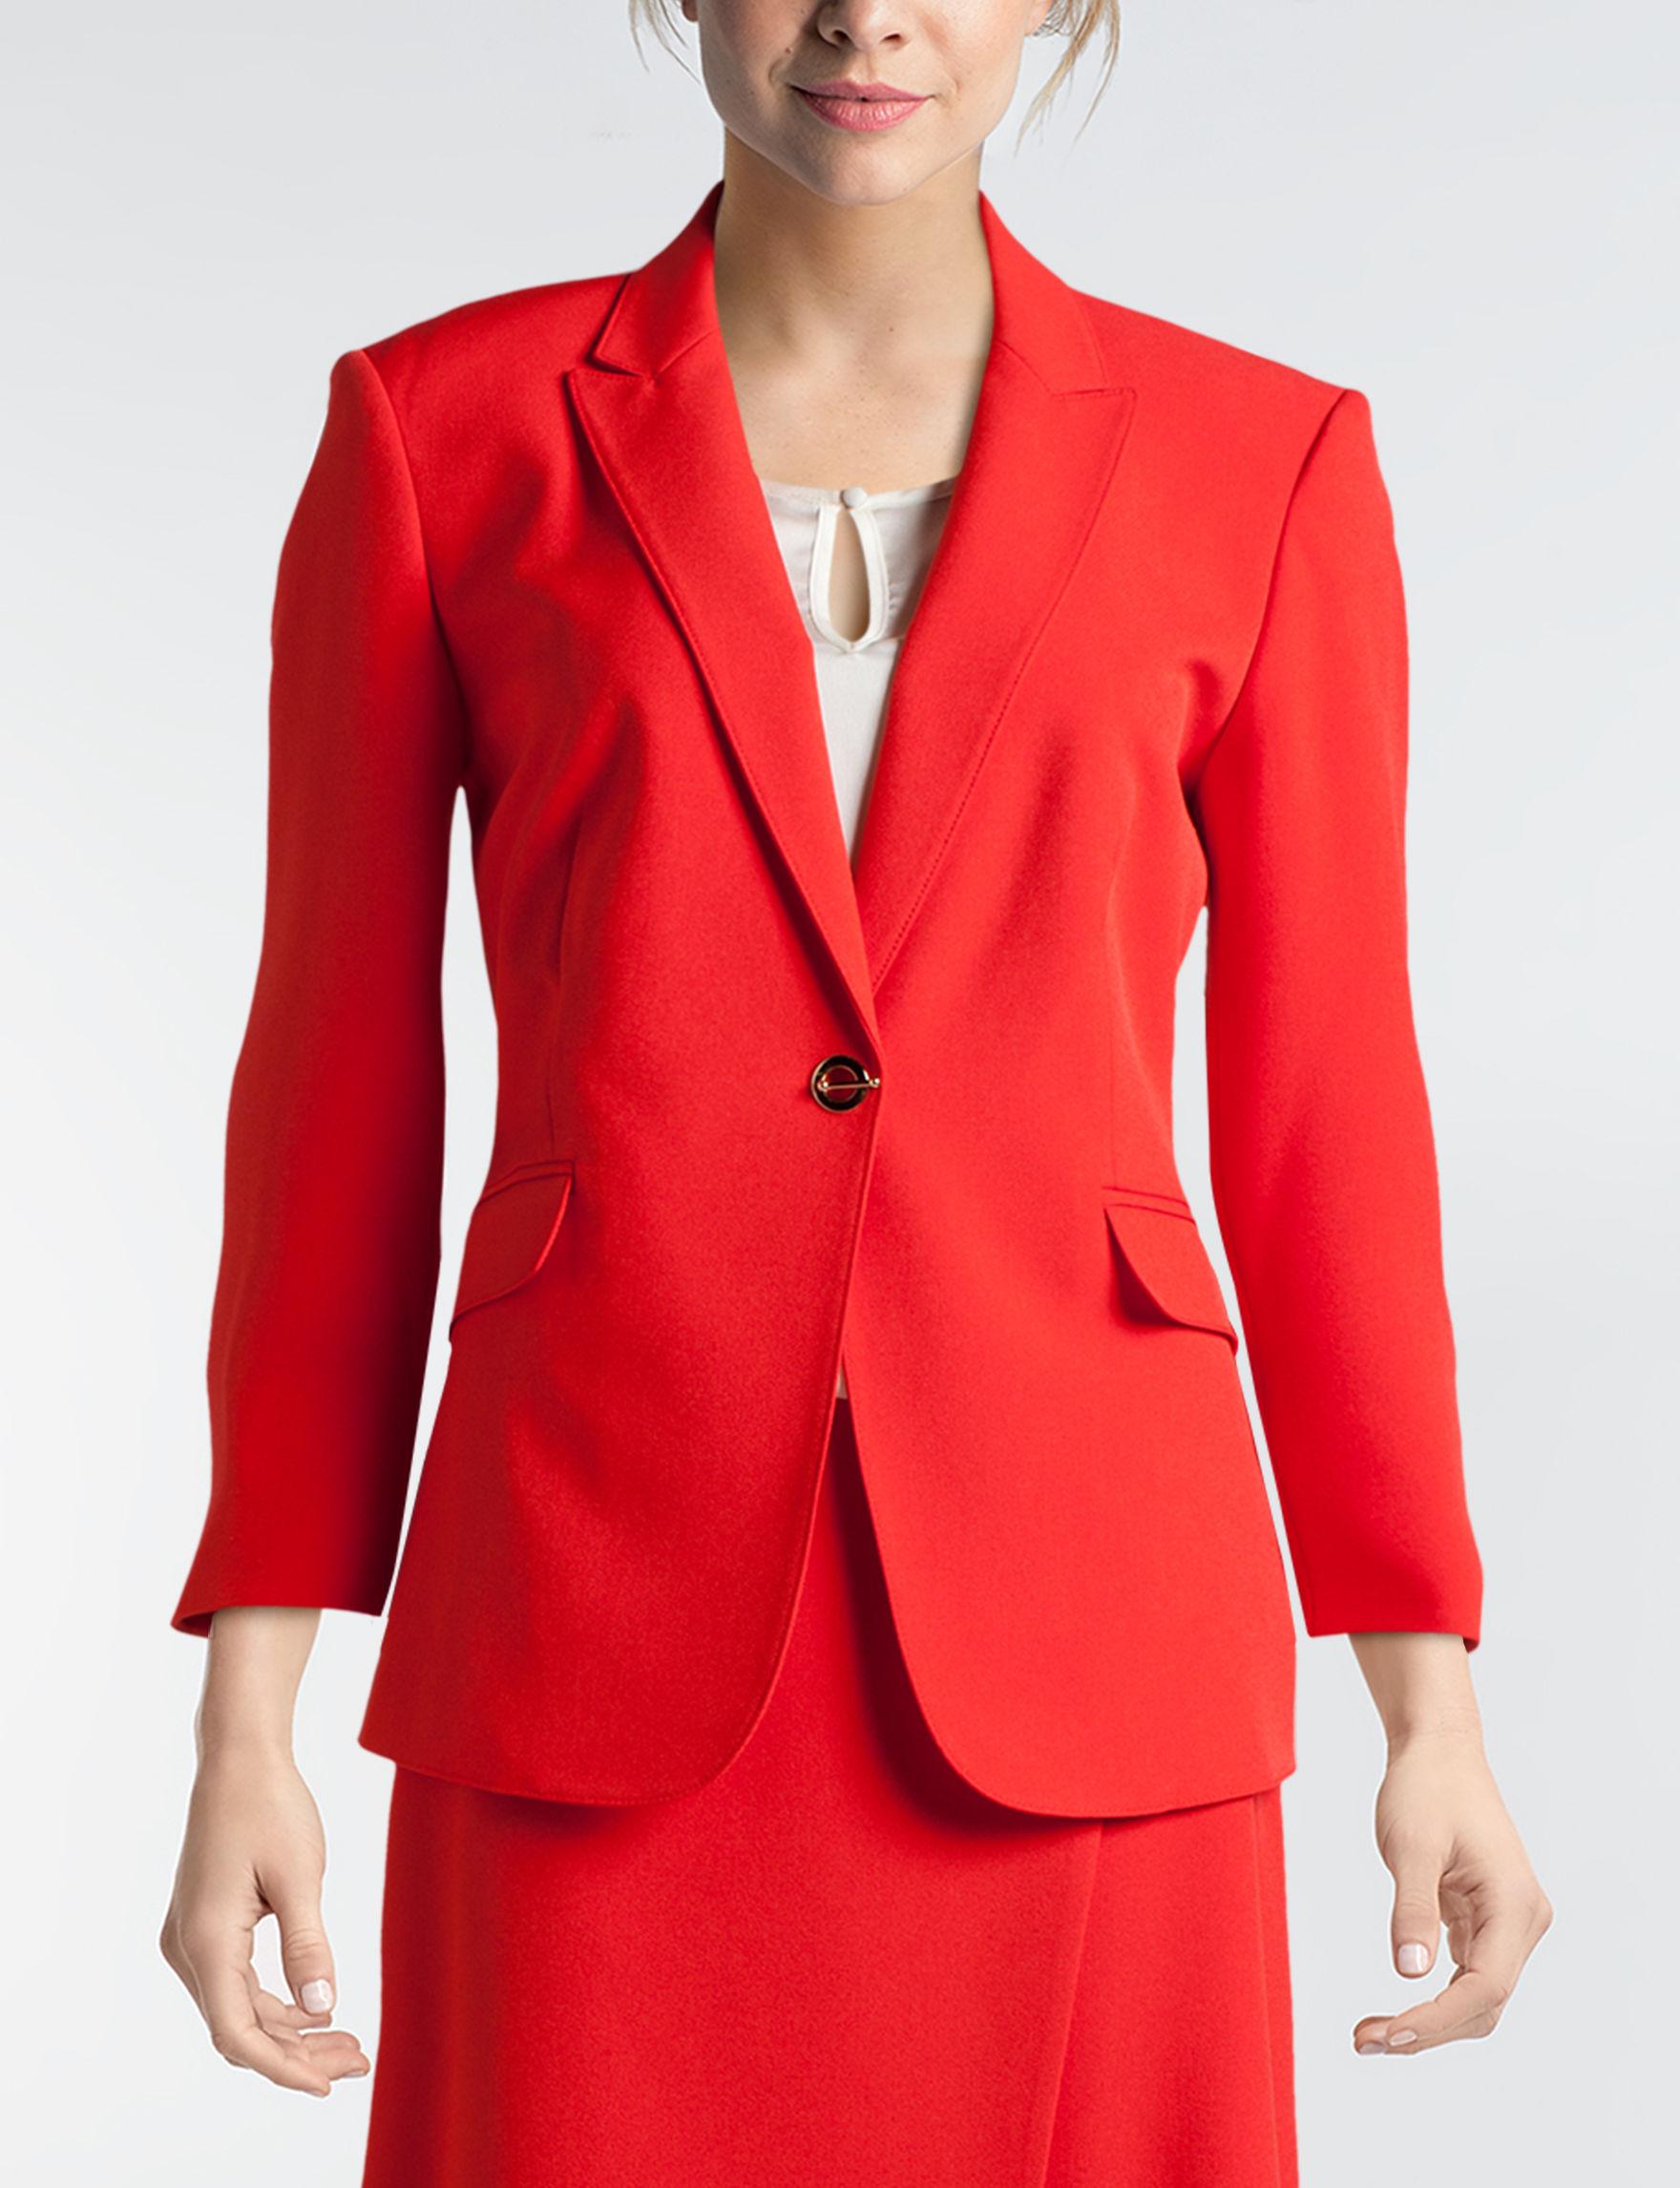 JM Studio Red Lightweight Jackets & Blazers